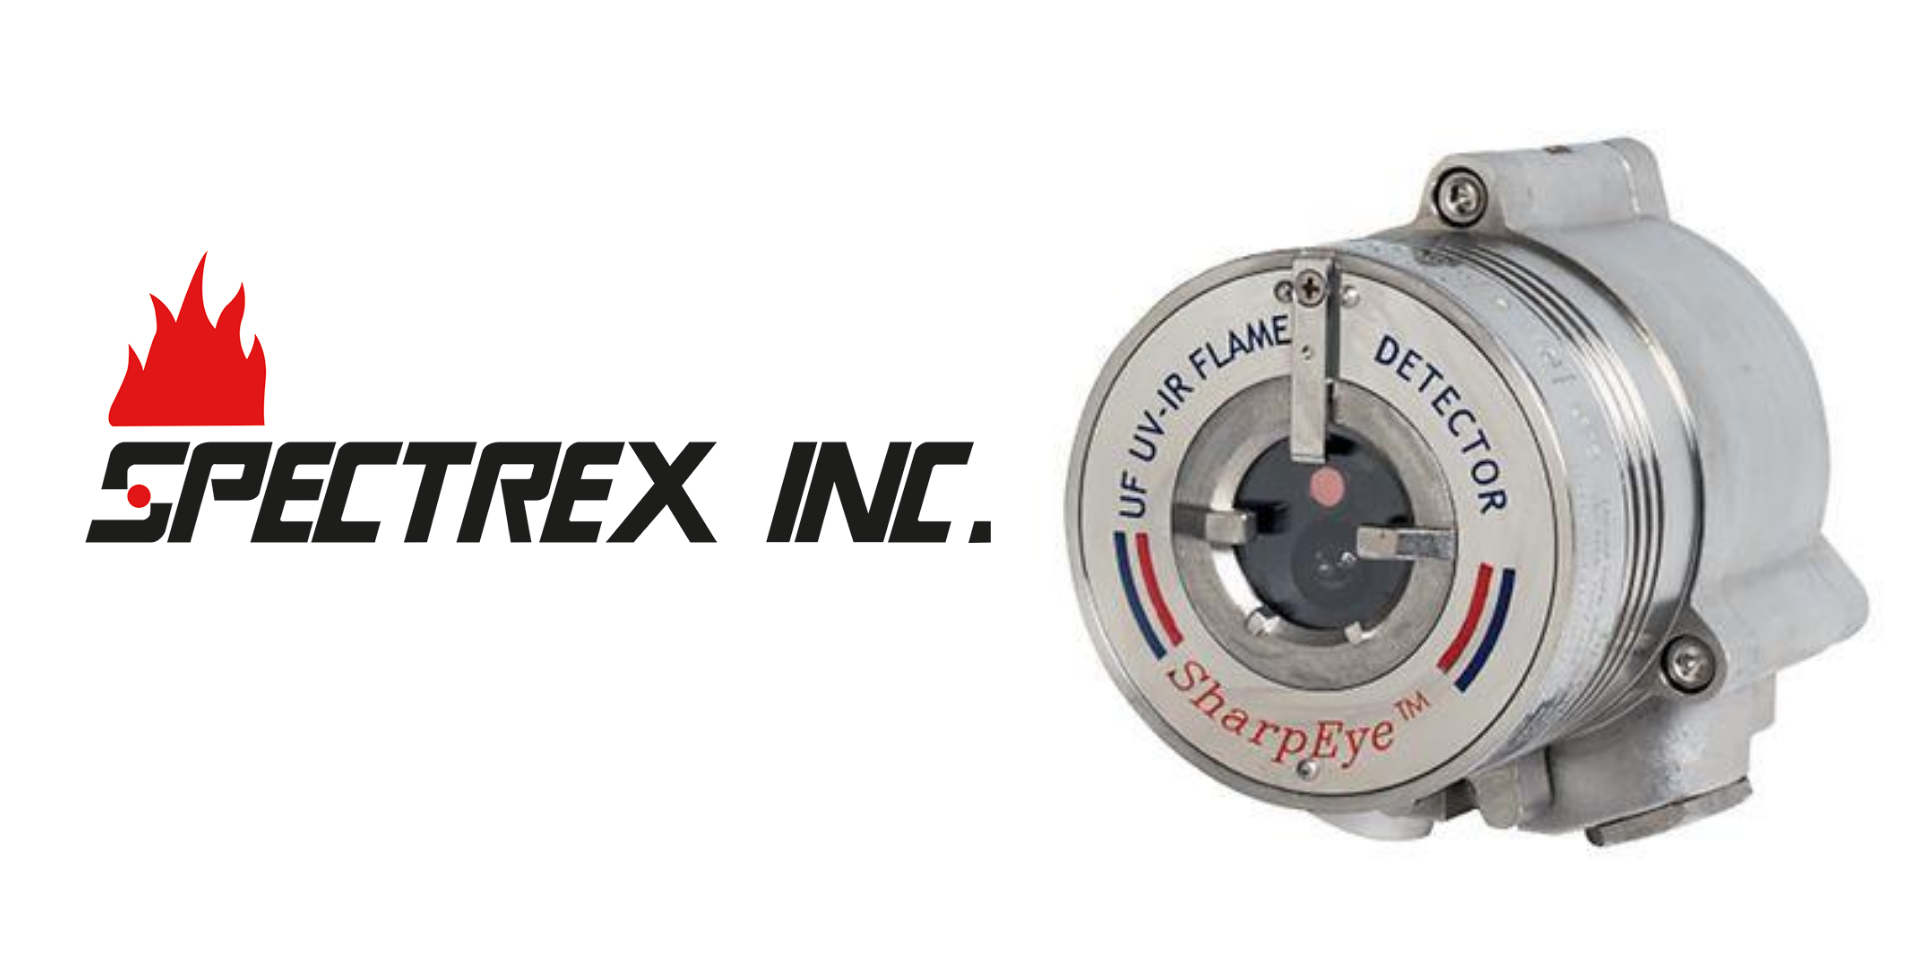 Spectrex 40/40UFL Ultra Fast UV IR Flame Detector